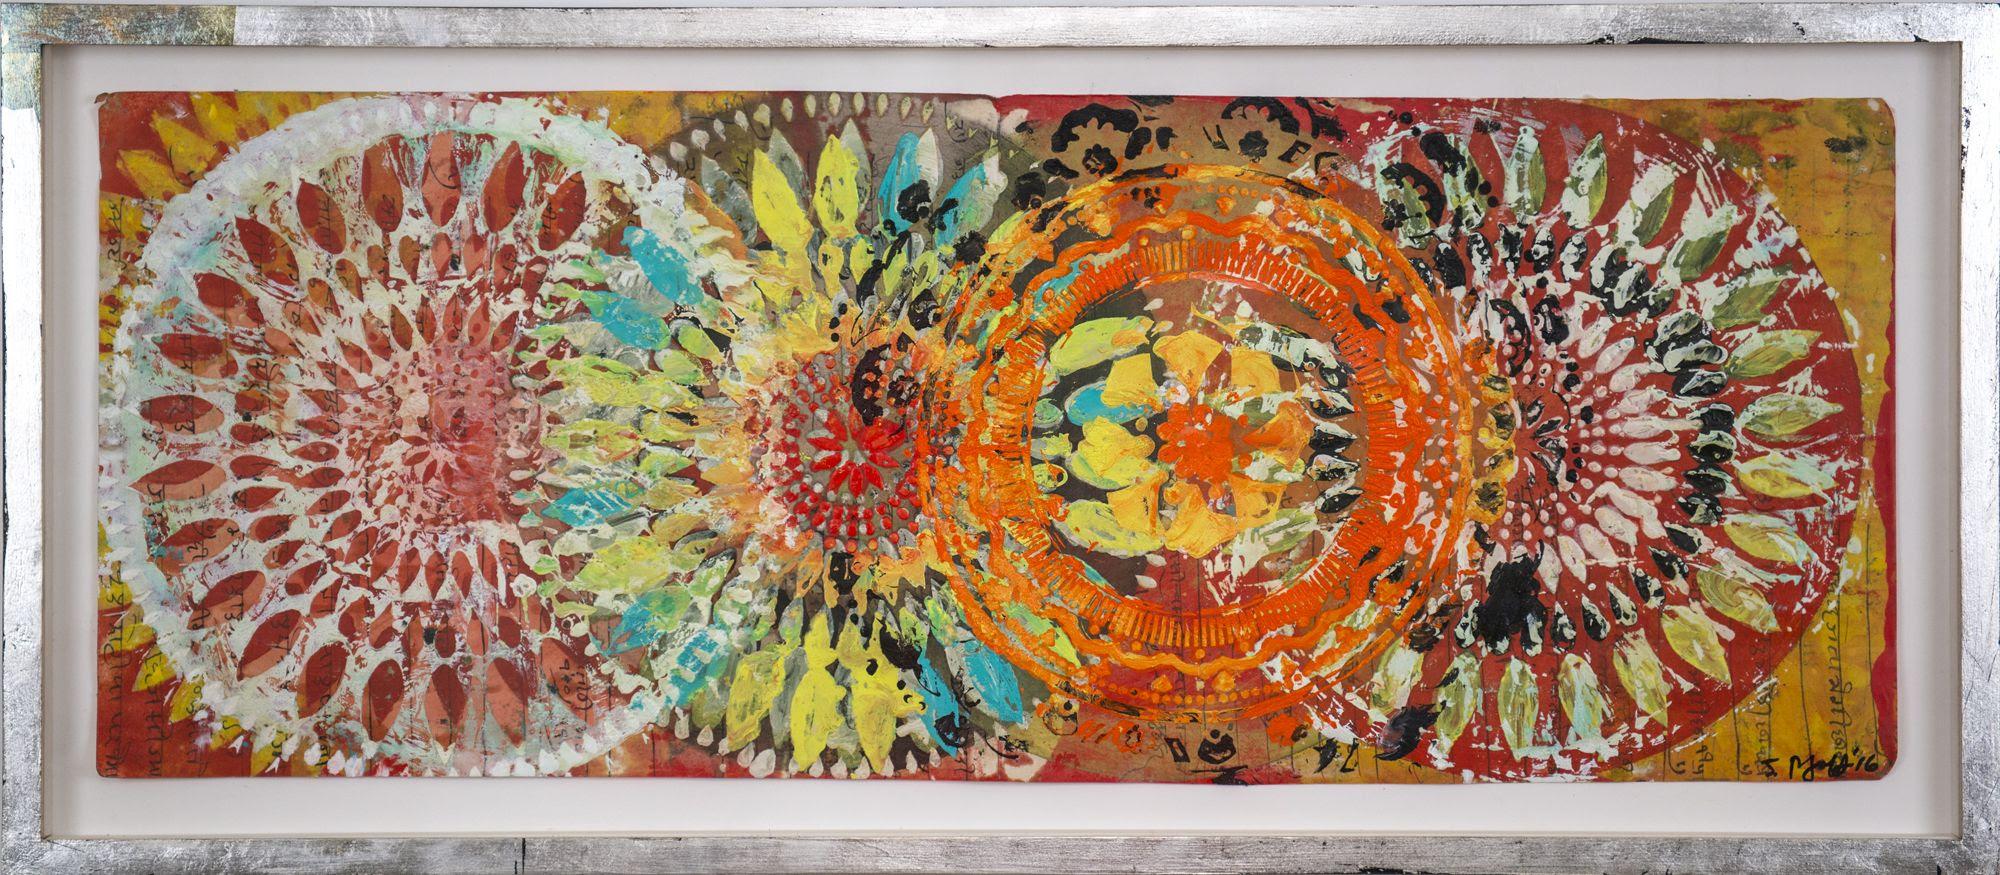 Judy Pfaff, Abstratc Poetry galleria AICA capri